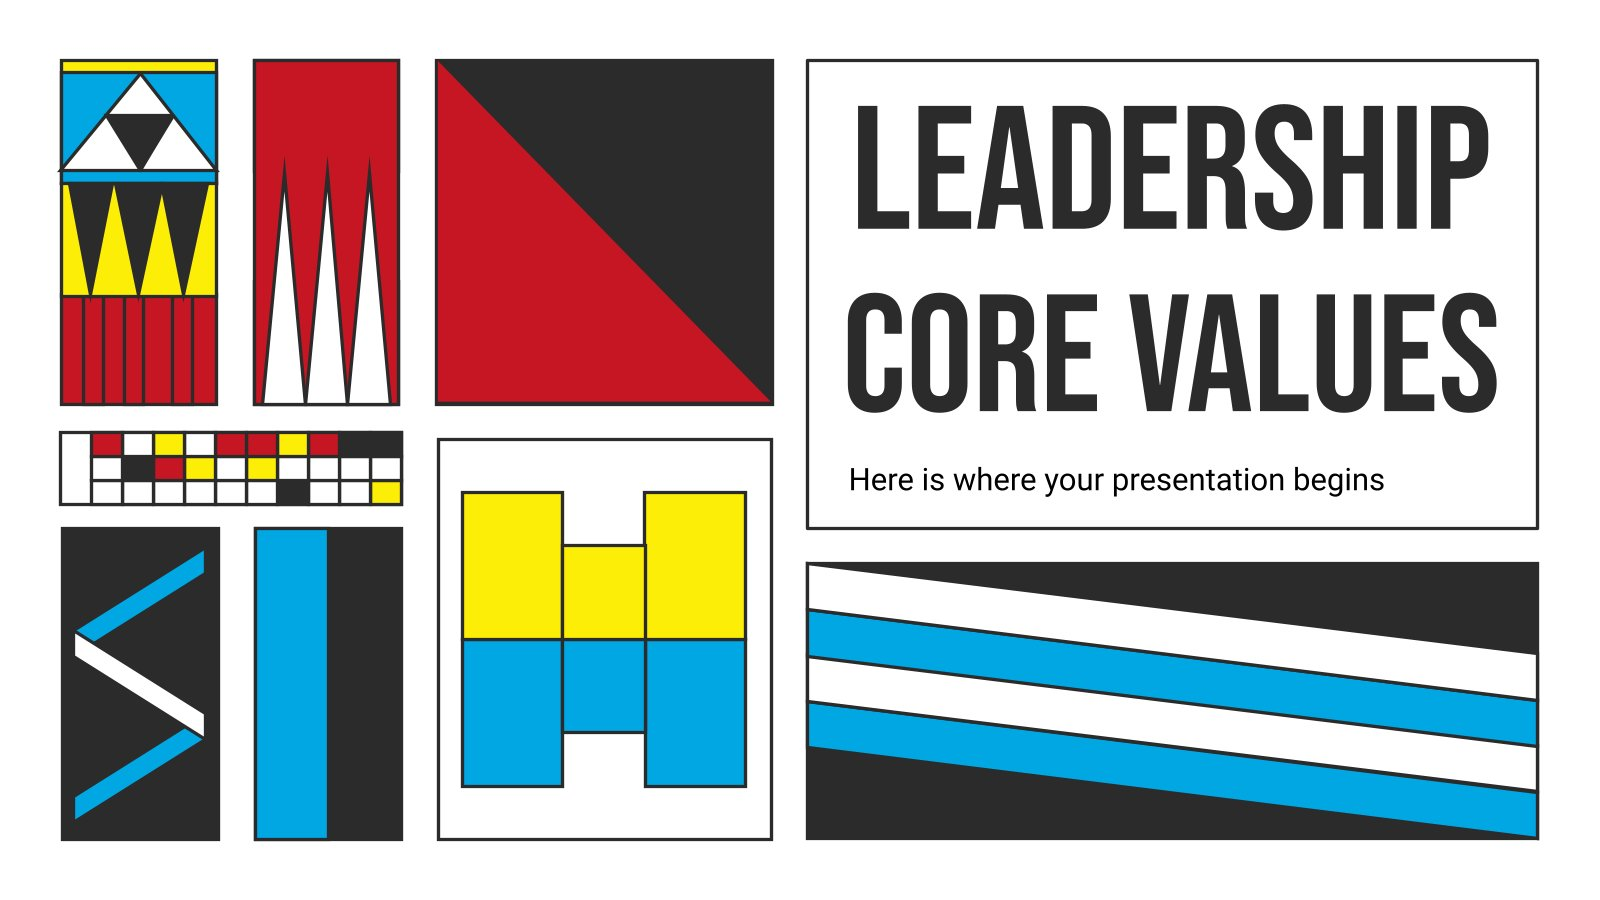 Leadership Core Values presentation template